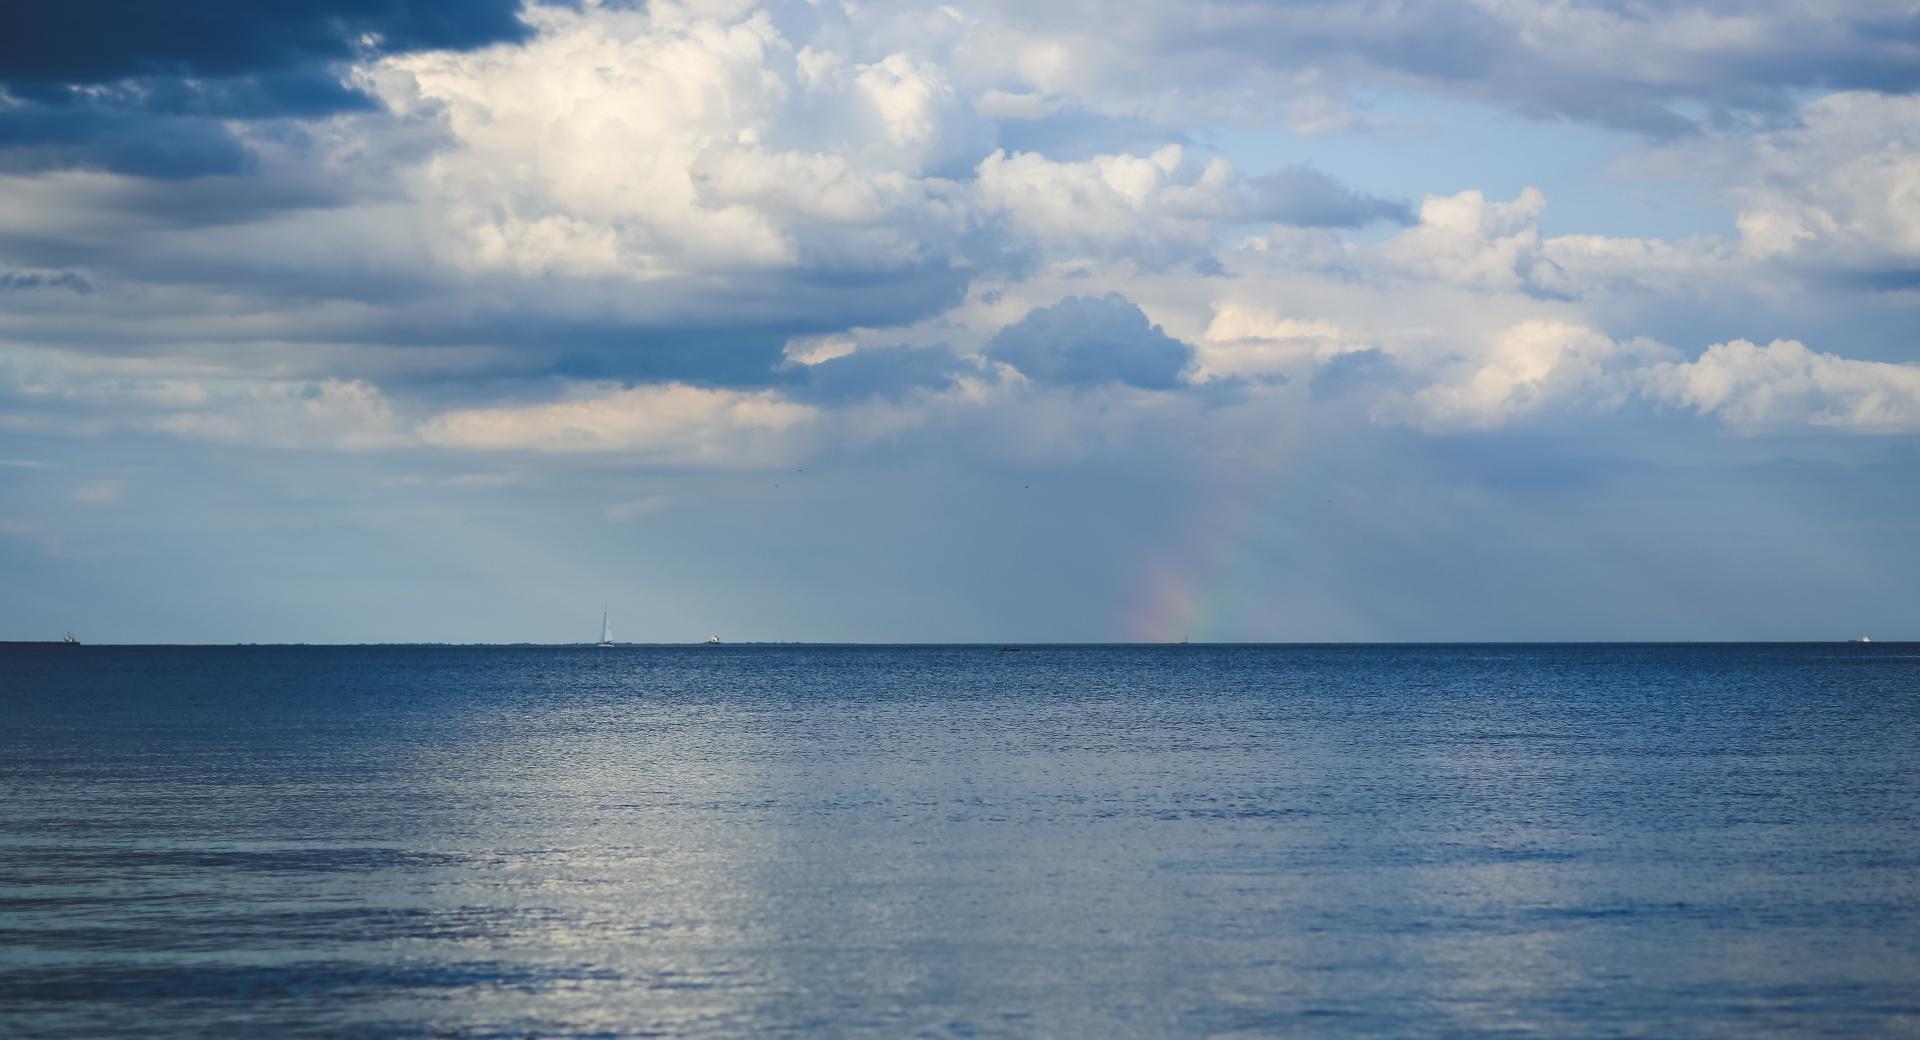 Baltic Sea wallpapers HD quality